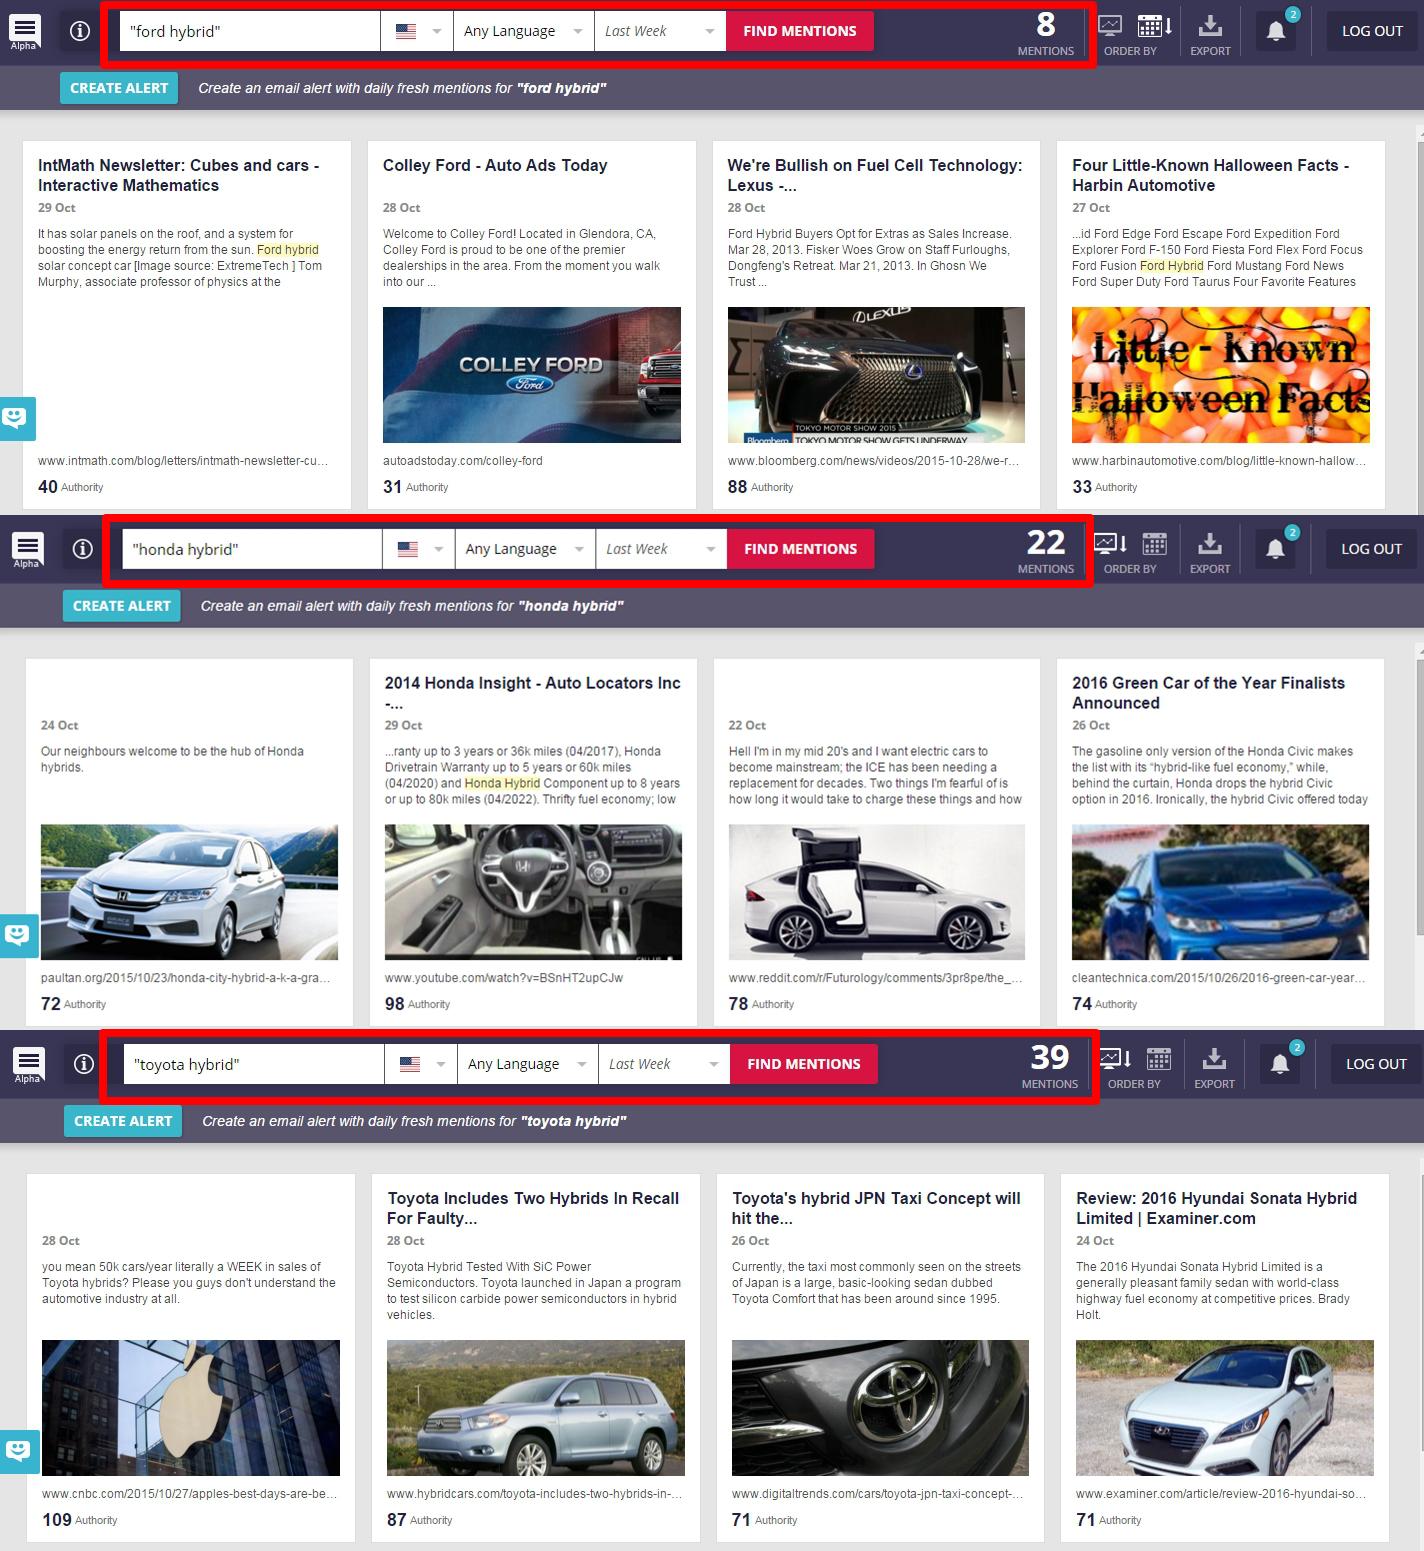 Hybrid Cars Comparison BrandMentions